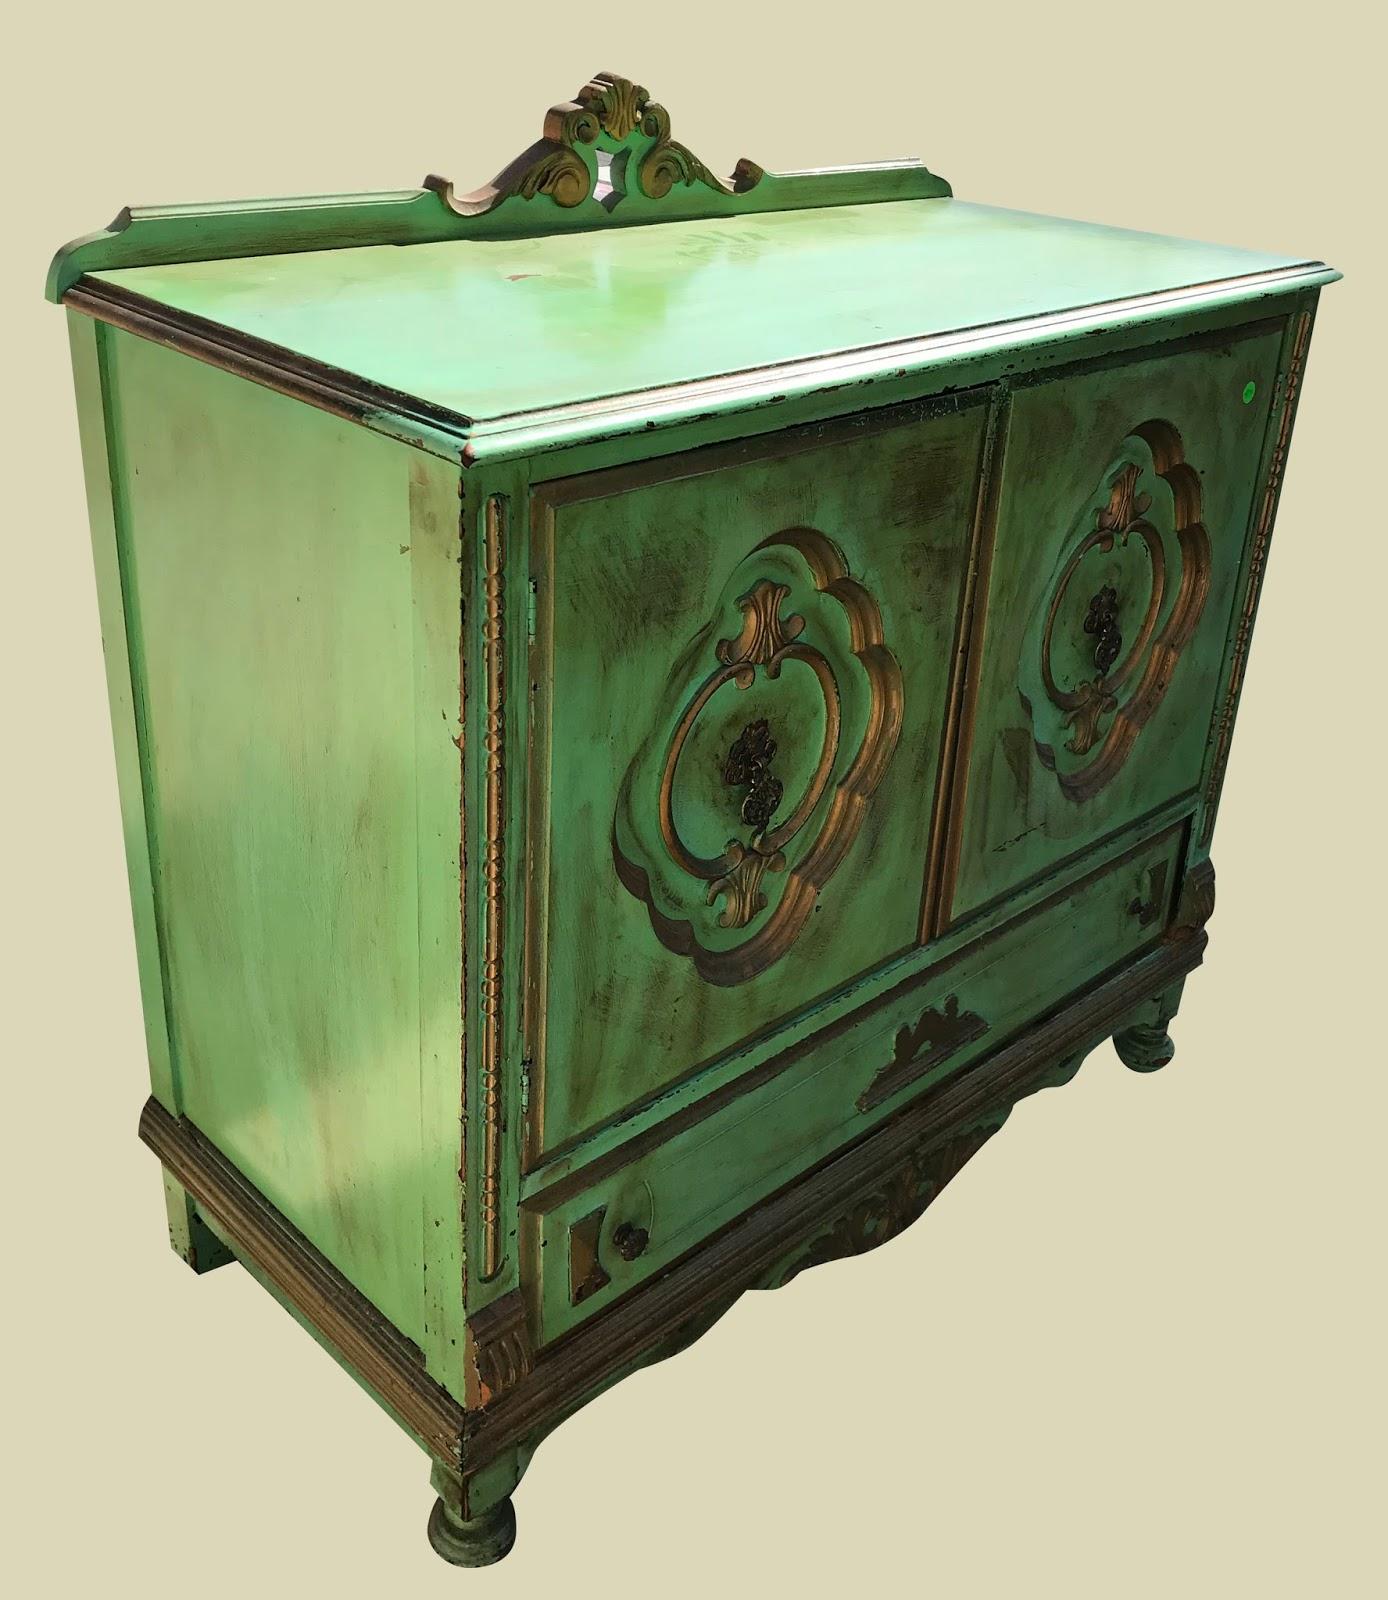 Discount Kitchen Cabinets Philadelphia: Uhuru Furniture & Collectibles